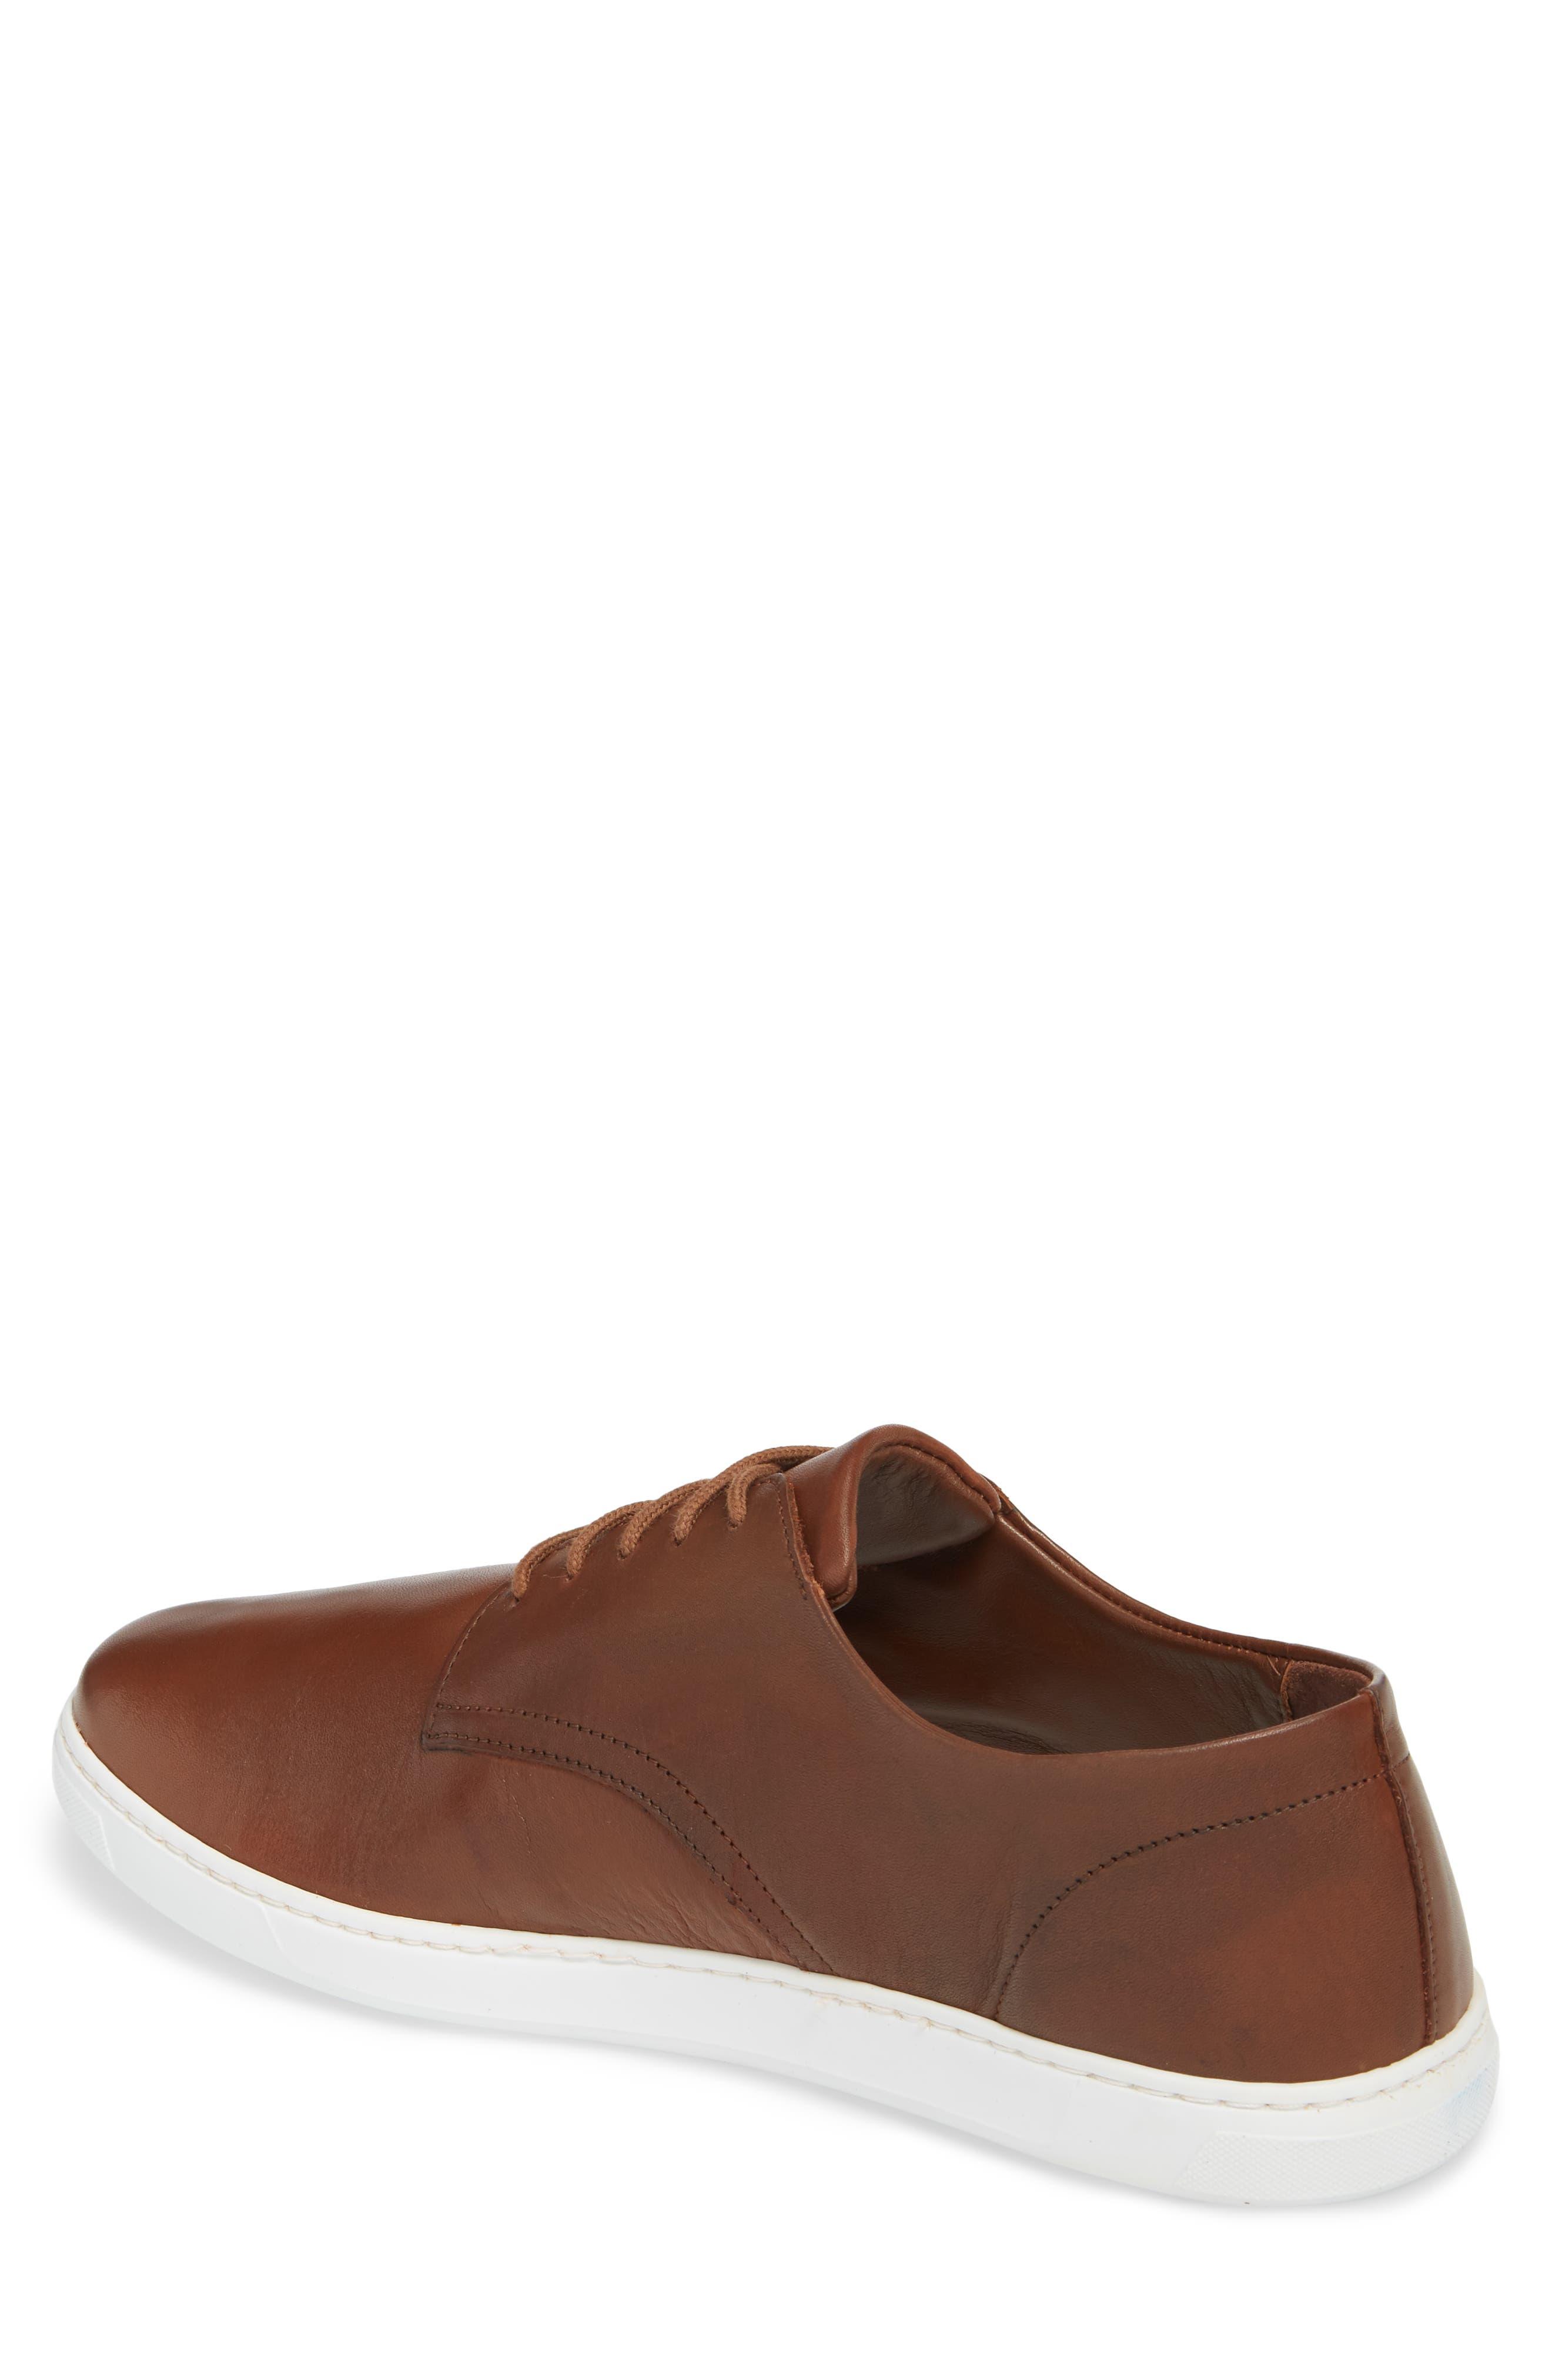 Nok Derby Sneaker,                             Alternate thumbnail 2, color,                             Brown Leather